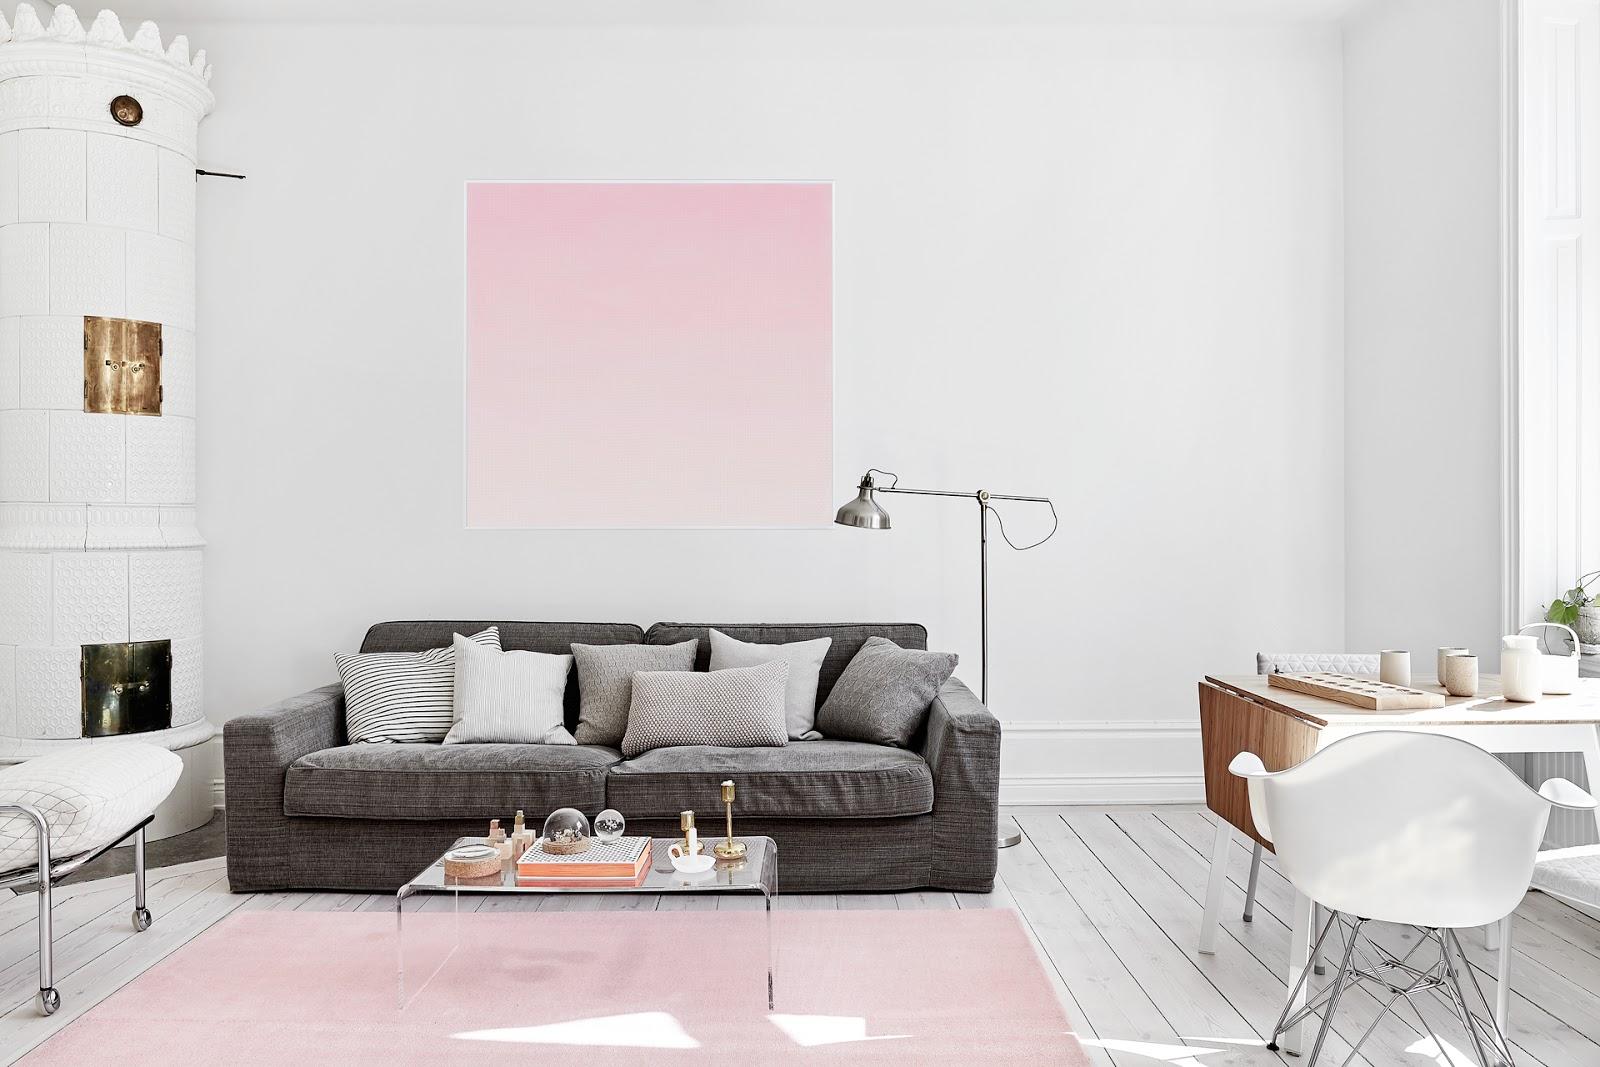 coffee in the sun: Sereen wit met een vleugje roze